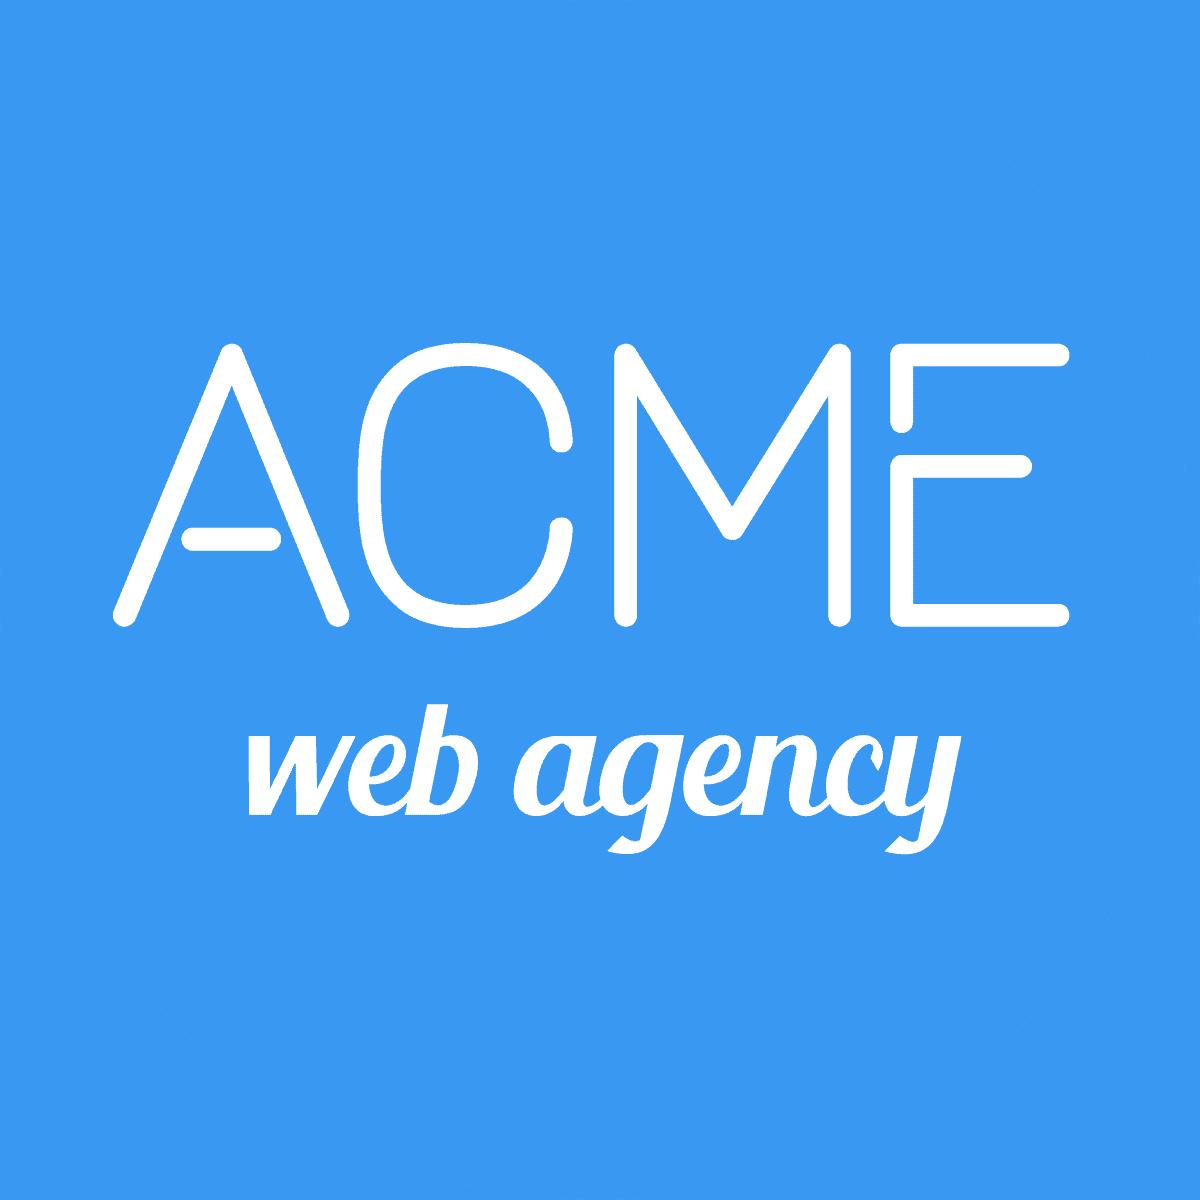 Acme web agency